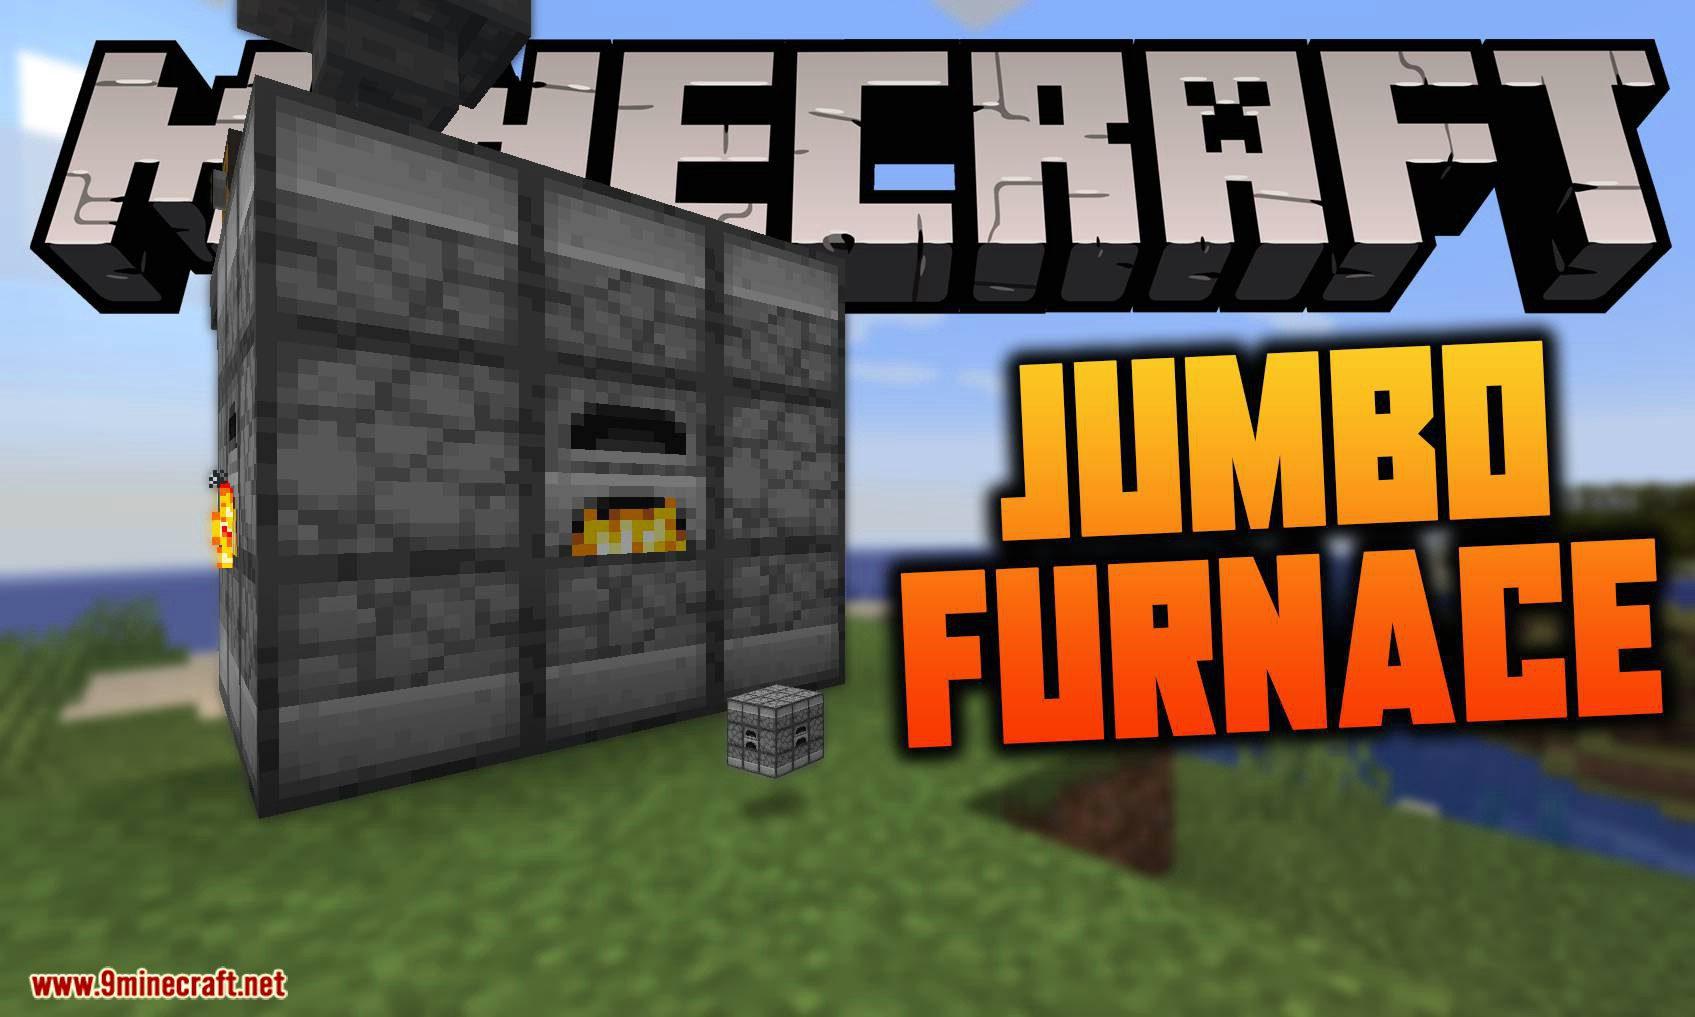 Jumbo Furnace mod for minecraft logo